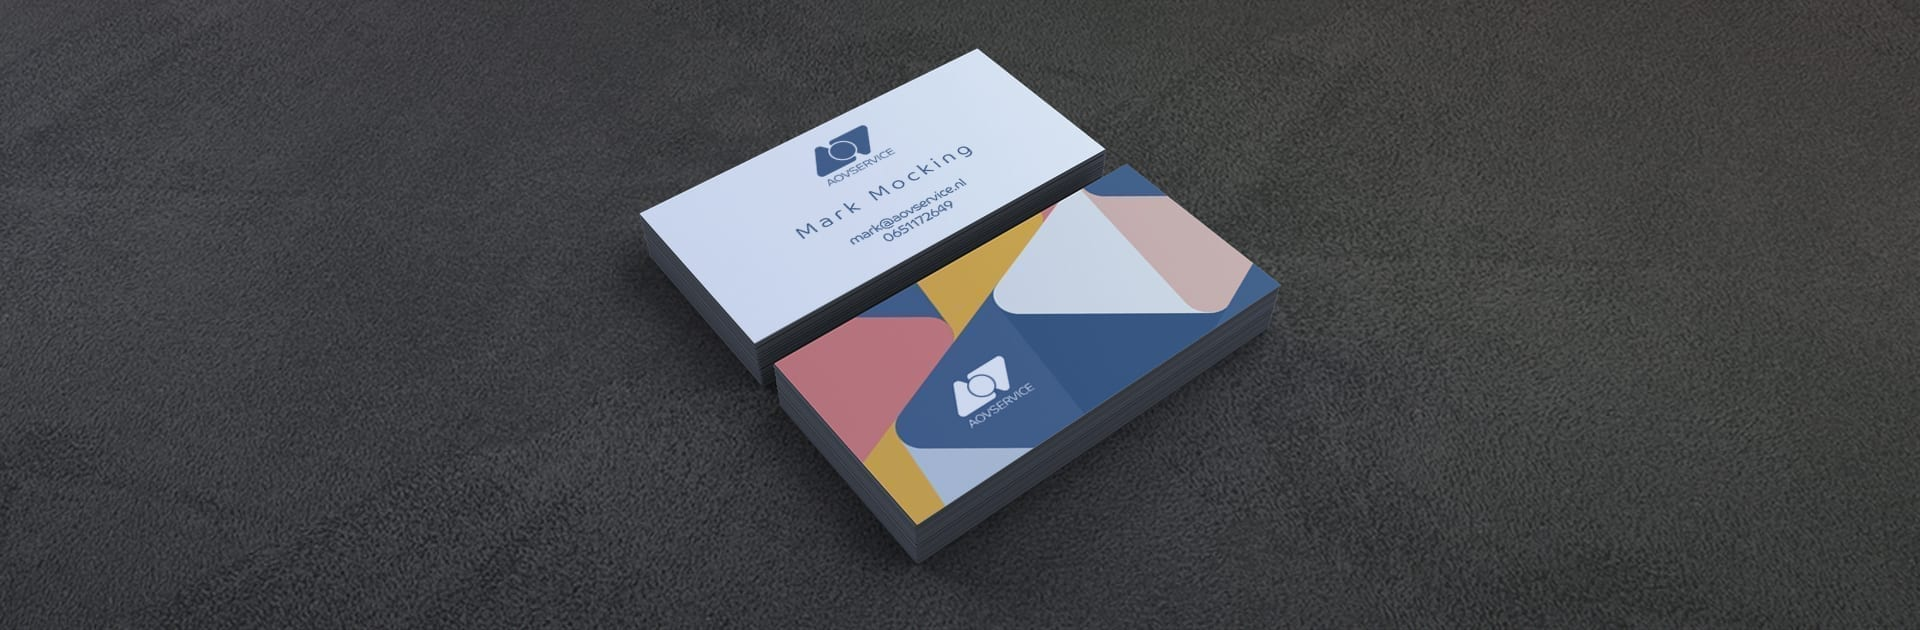 aov_card_mockup